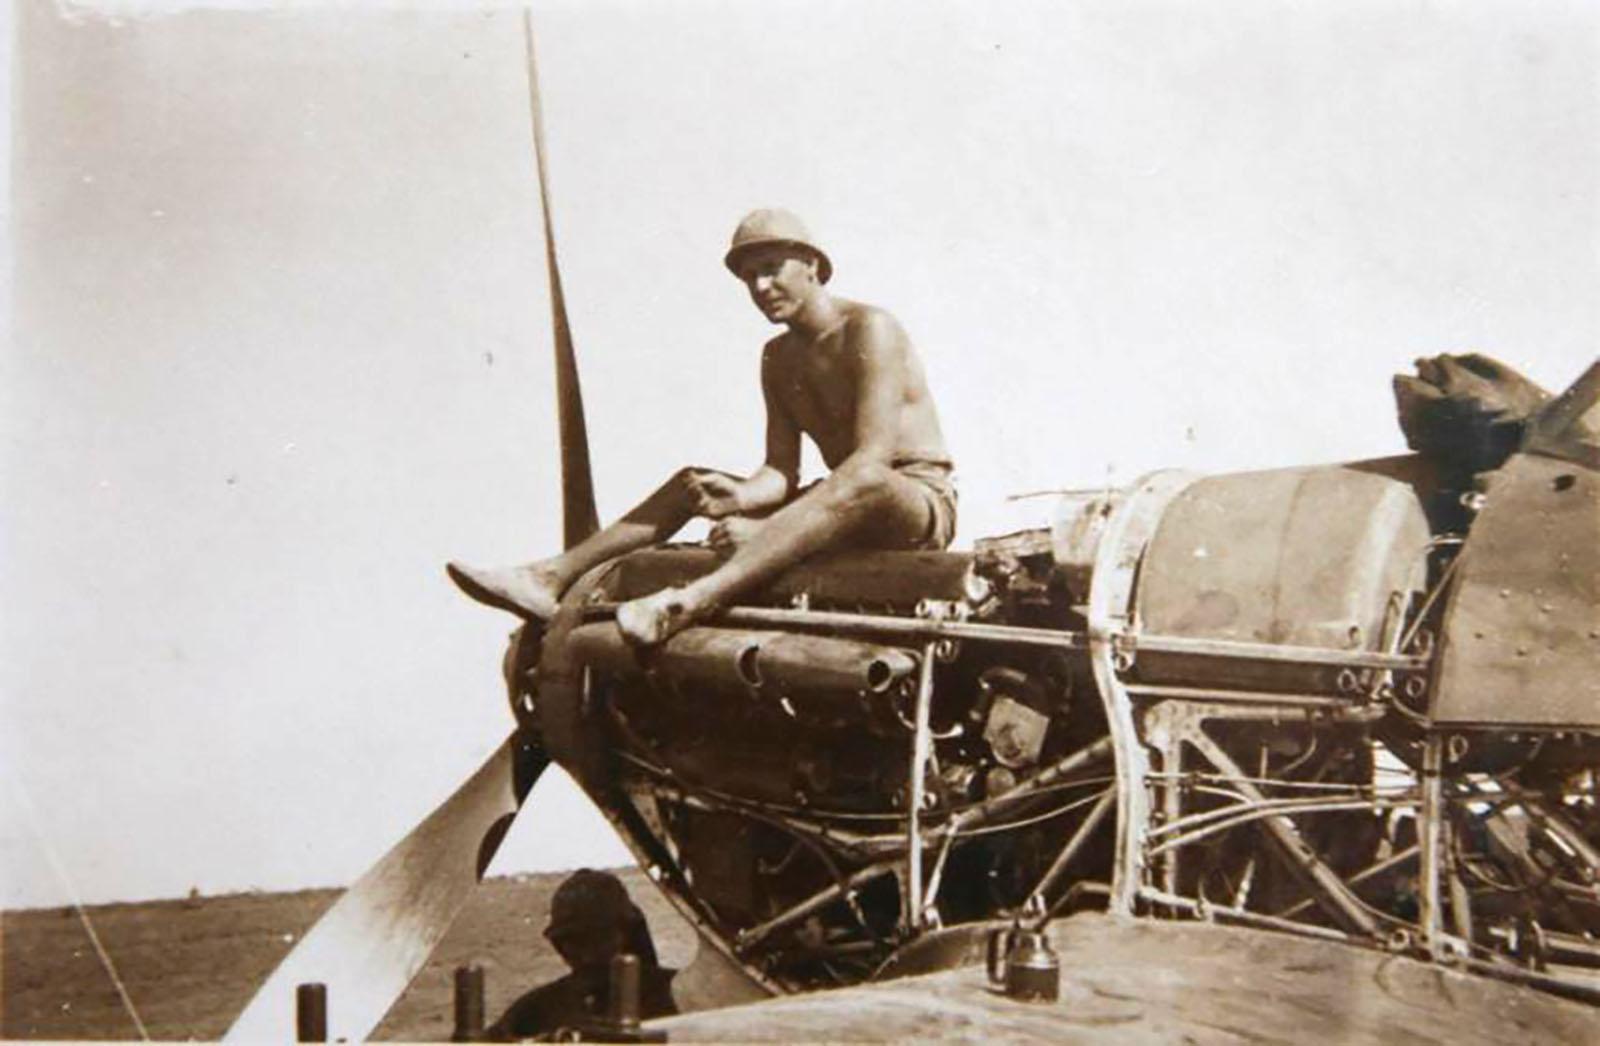 Hurricane I Trop SAAF 3Sqn U Bob Kershaw Dagahbur Ethiopia East Africa March 1941 06